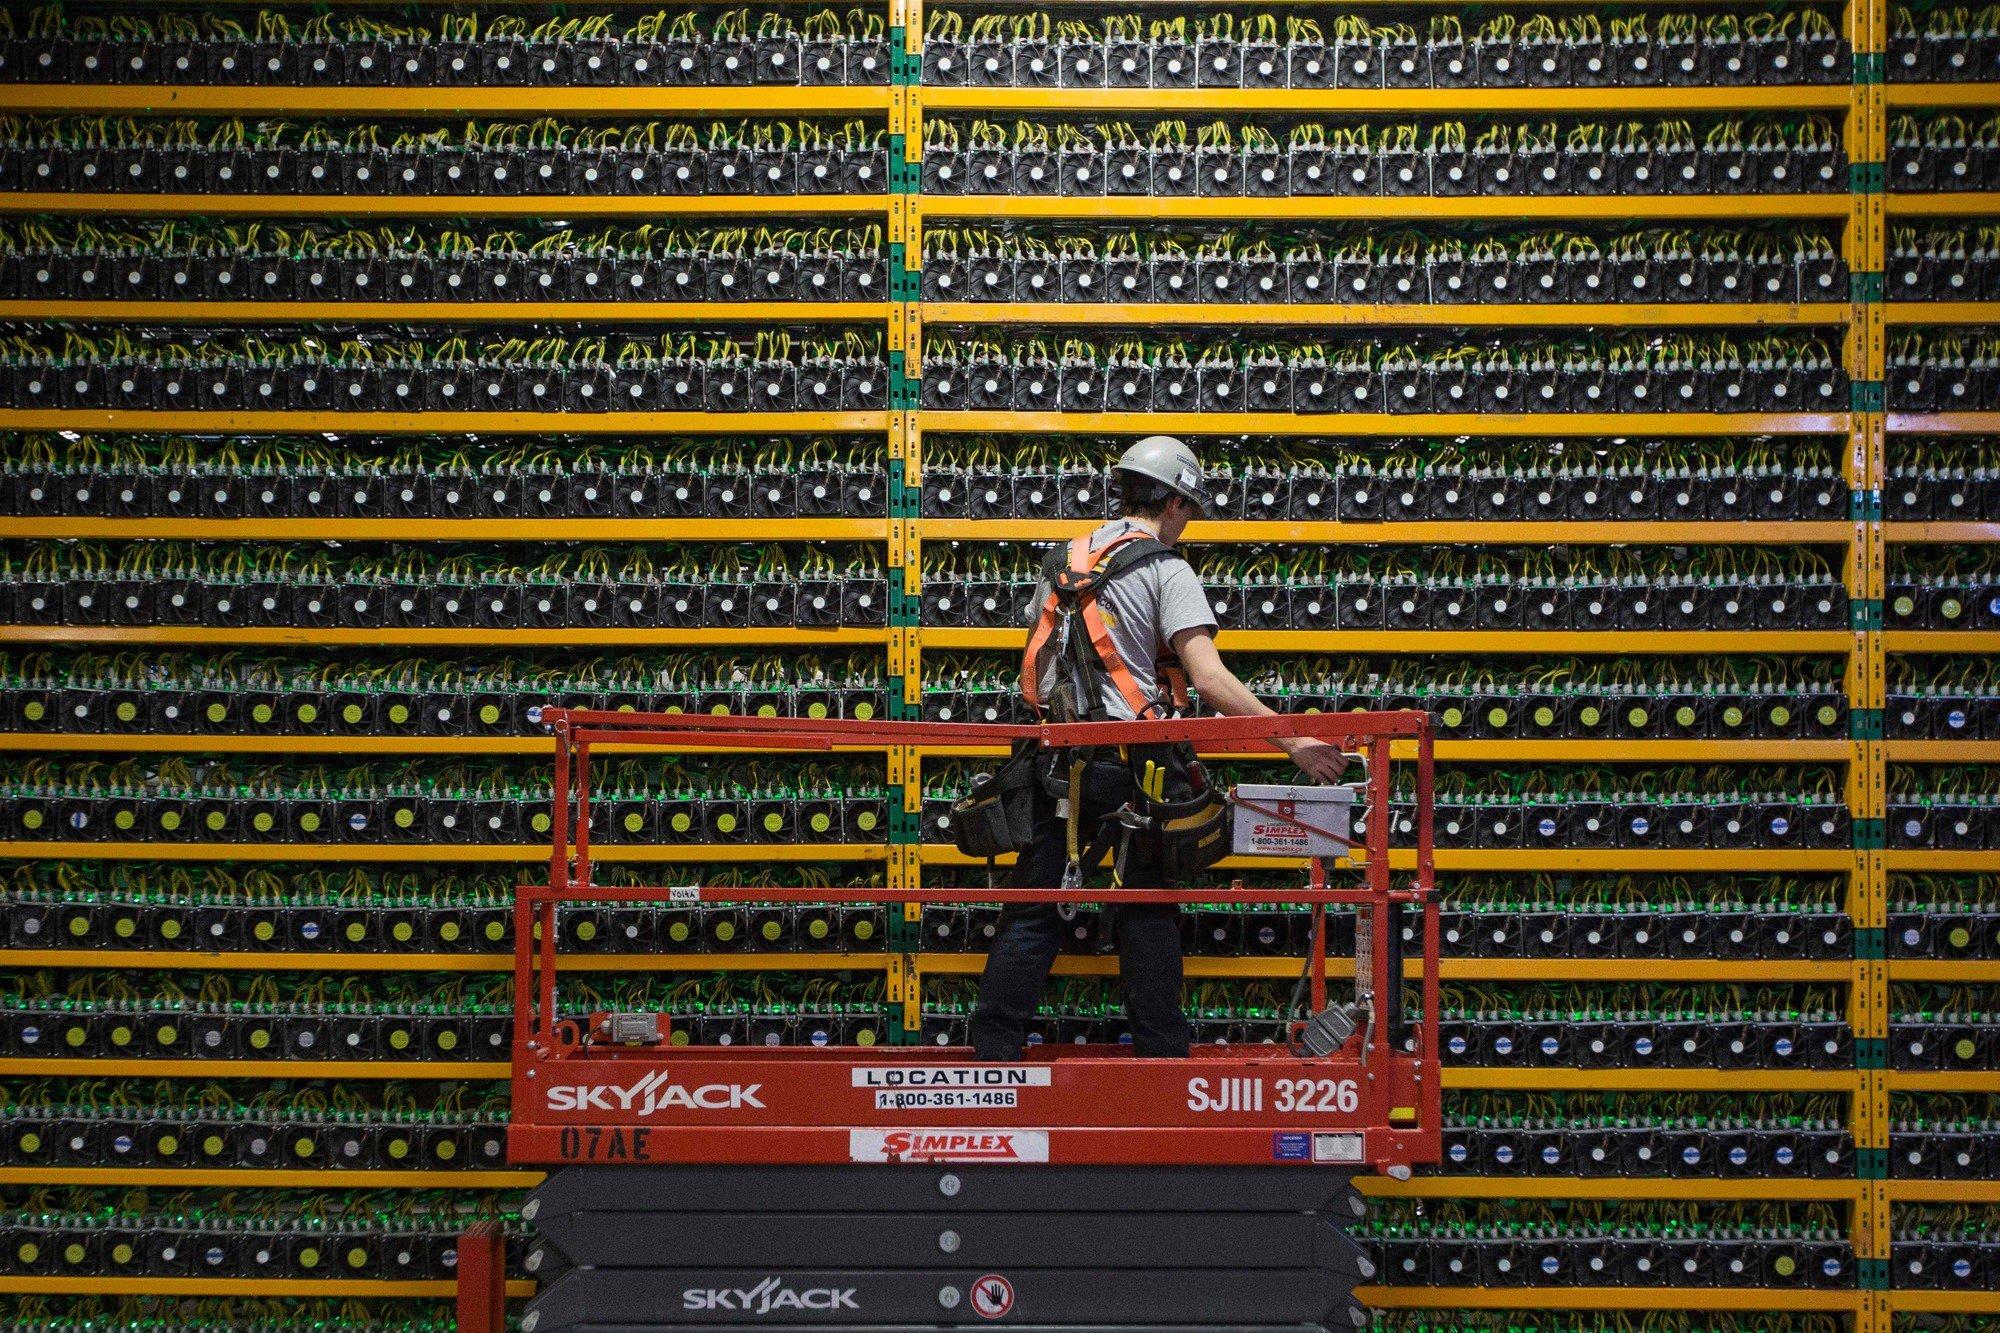 Bitcoin Mining Giant Canaan Raises 'Hundreds of Millions of Dollars'